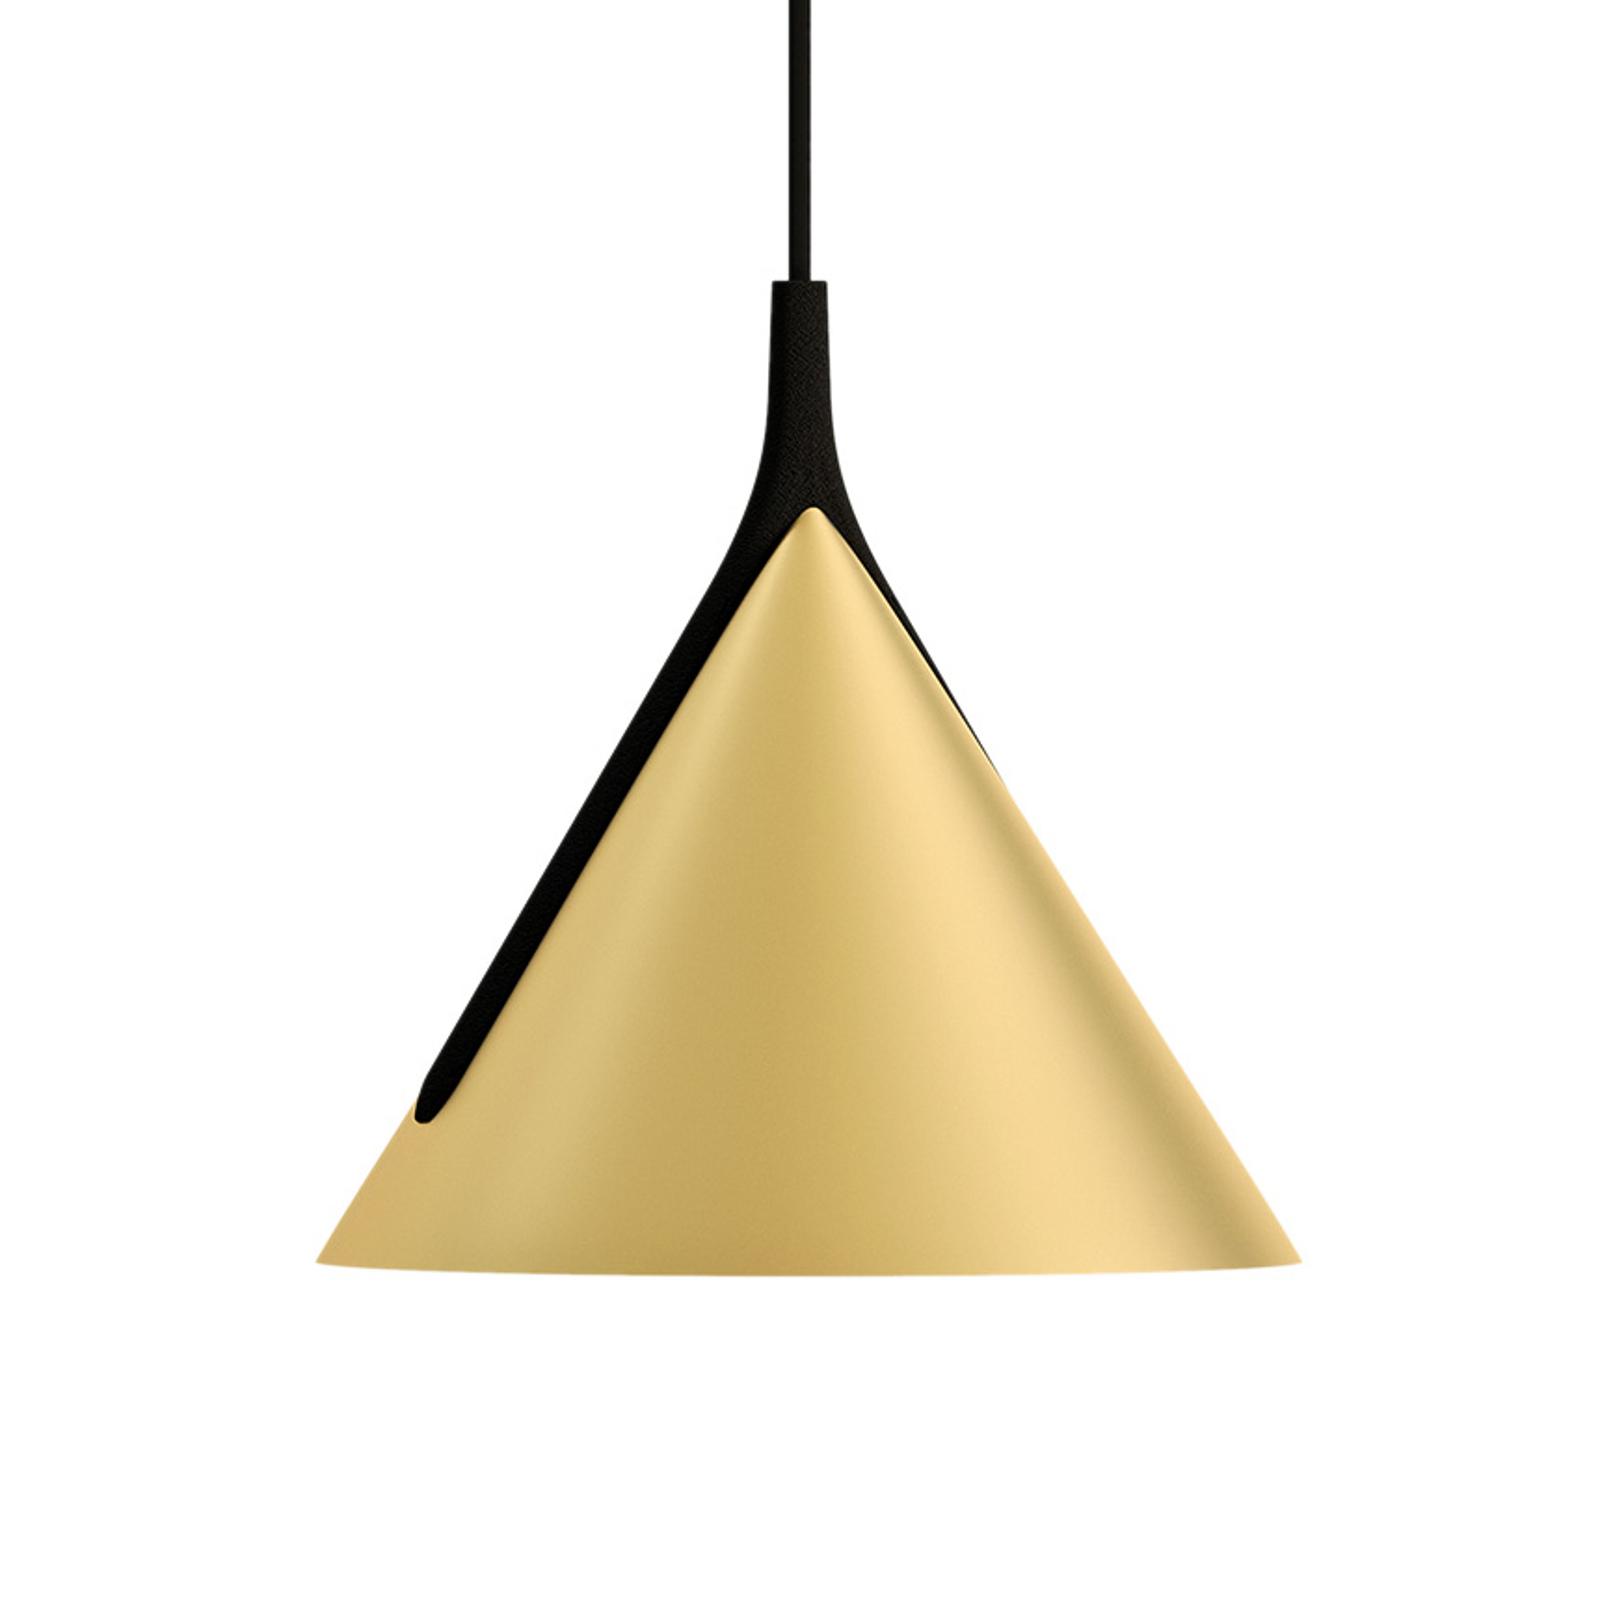 Axolight Jewel Mono Pendel schwarz-gold 2700K 38°